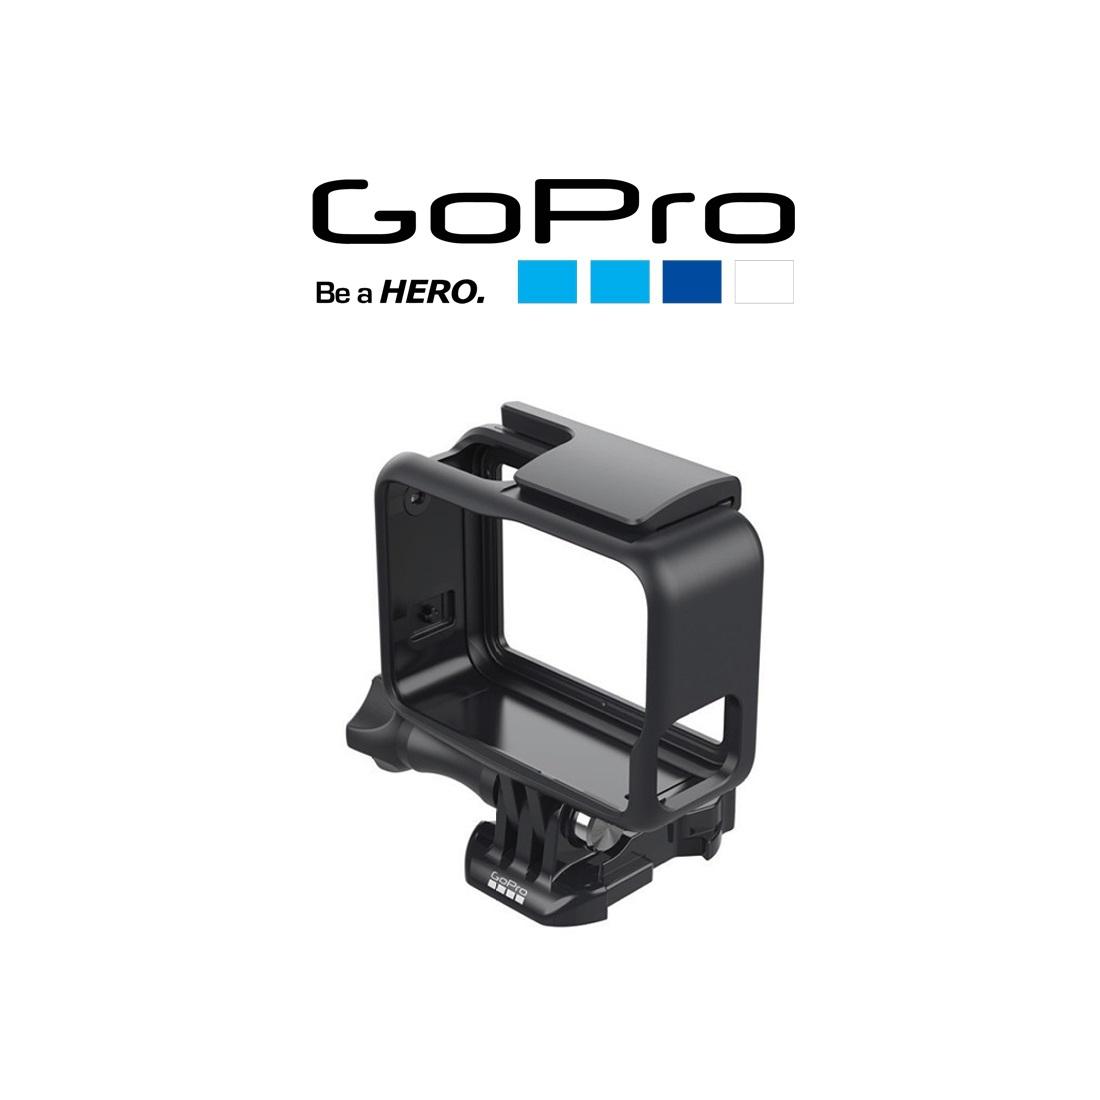 GOPRO AAFRM-001 FRAME MOUNT FOR HER (end 4/27/2020 12:11 PM)